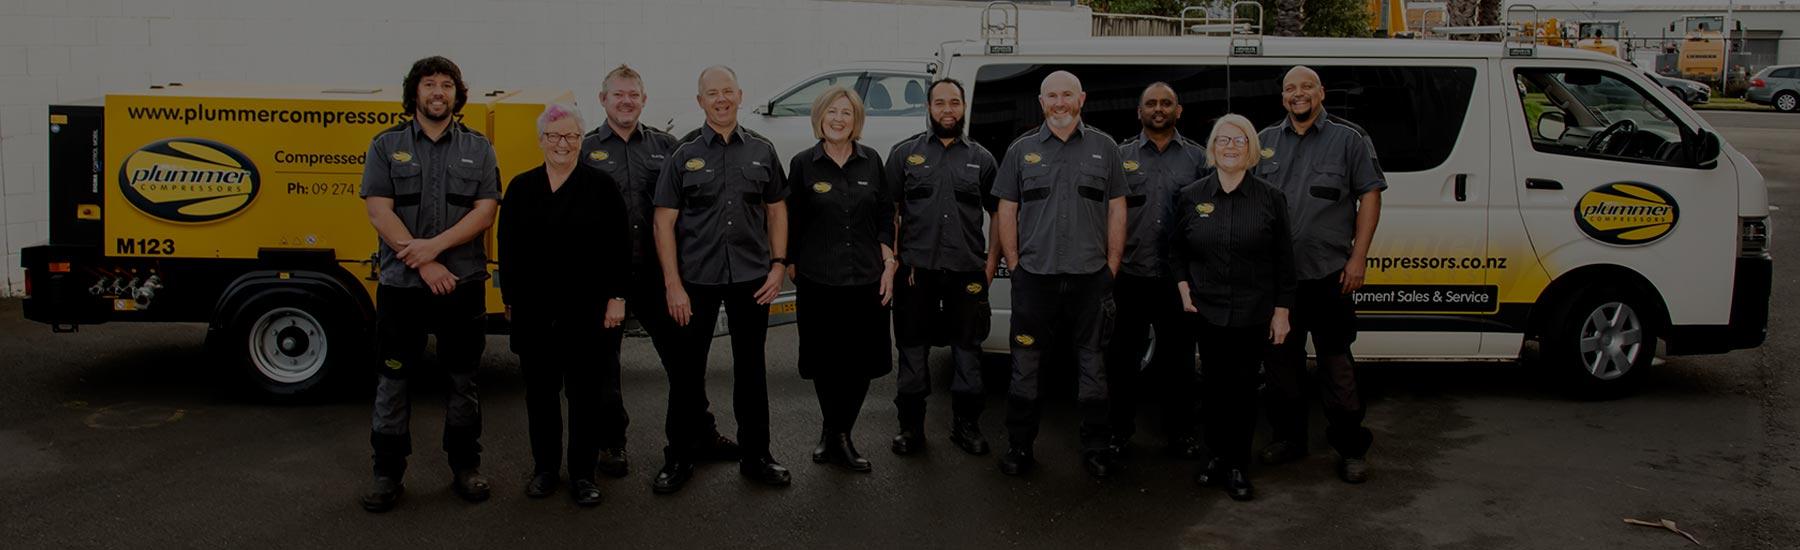 Plummer Compressors - Team